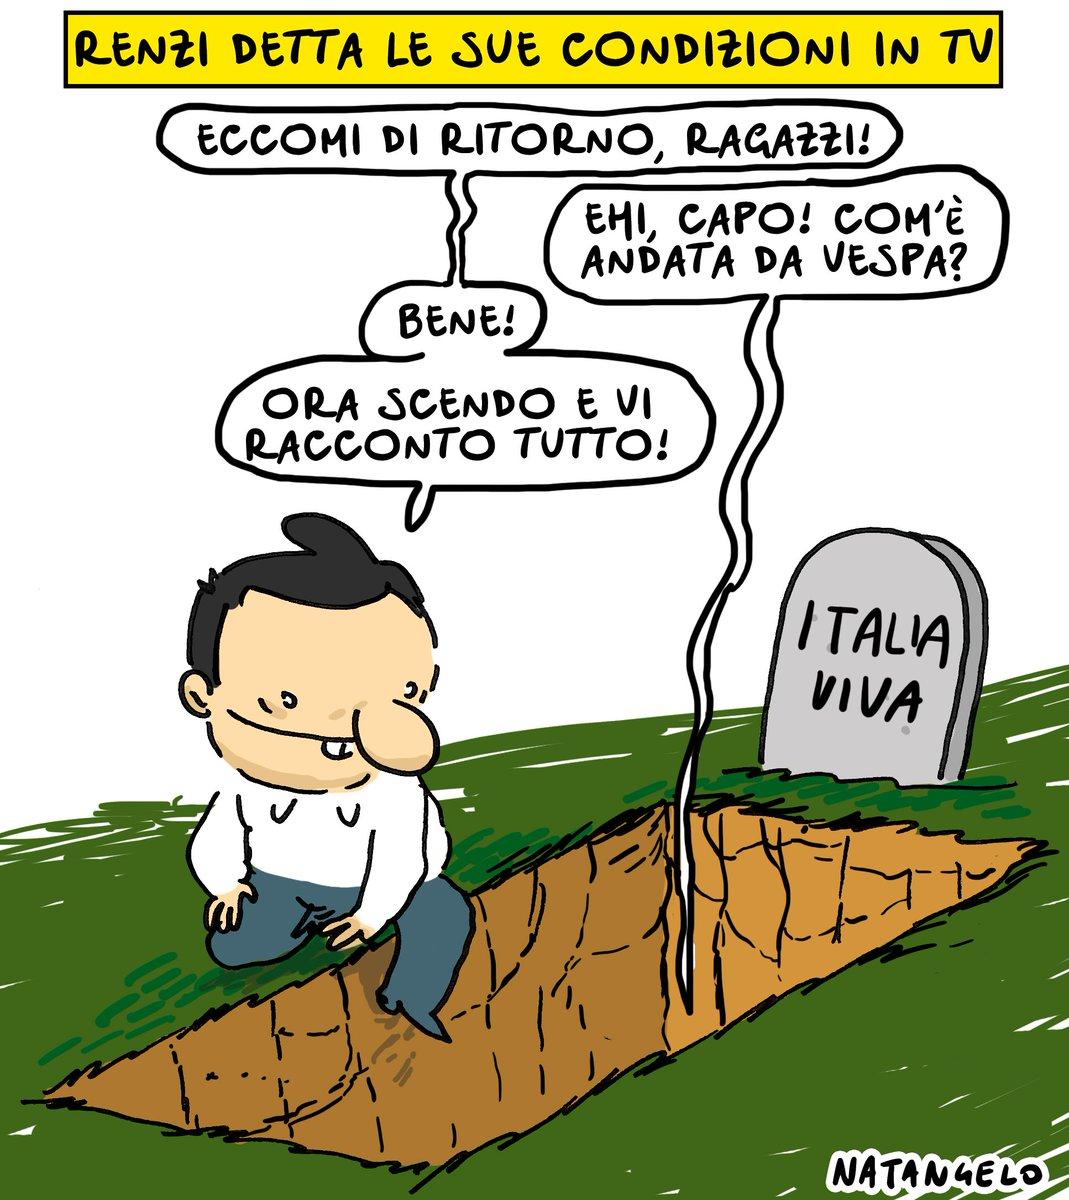 #portaaporta